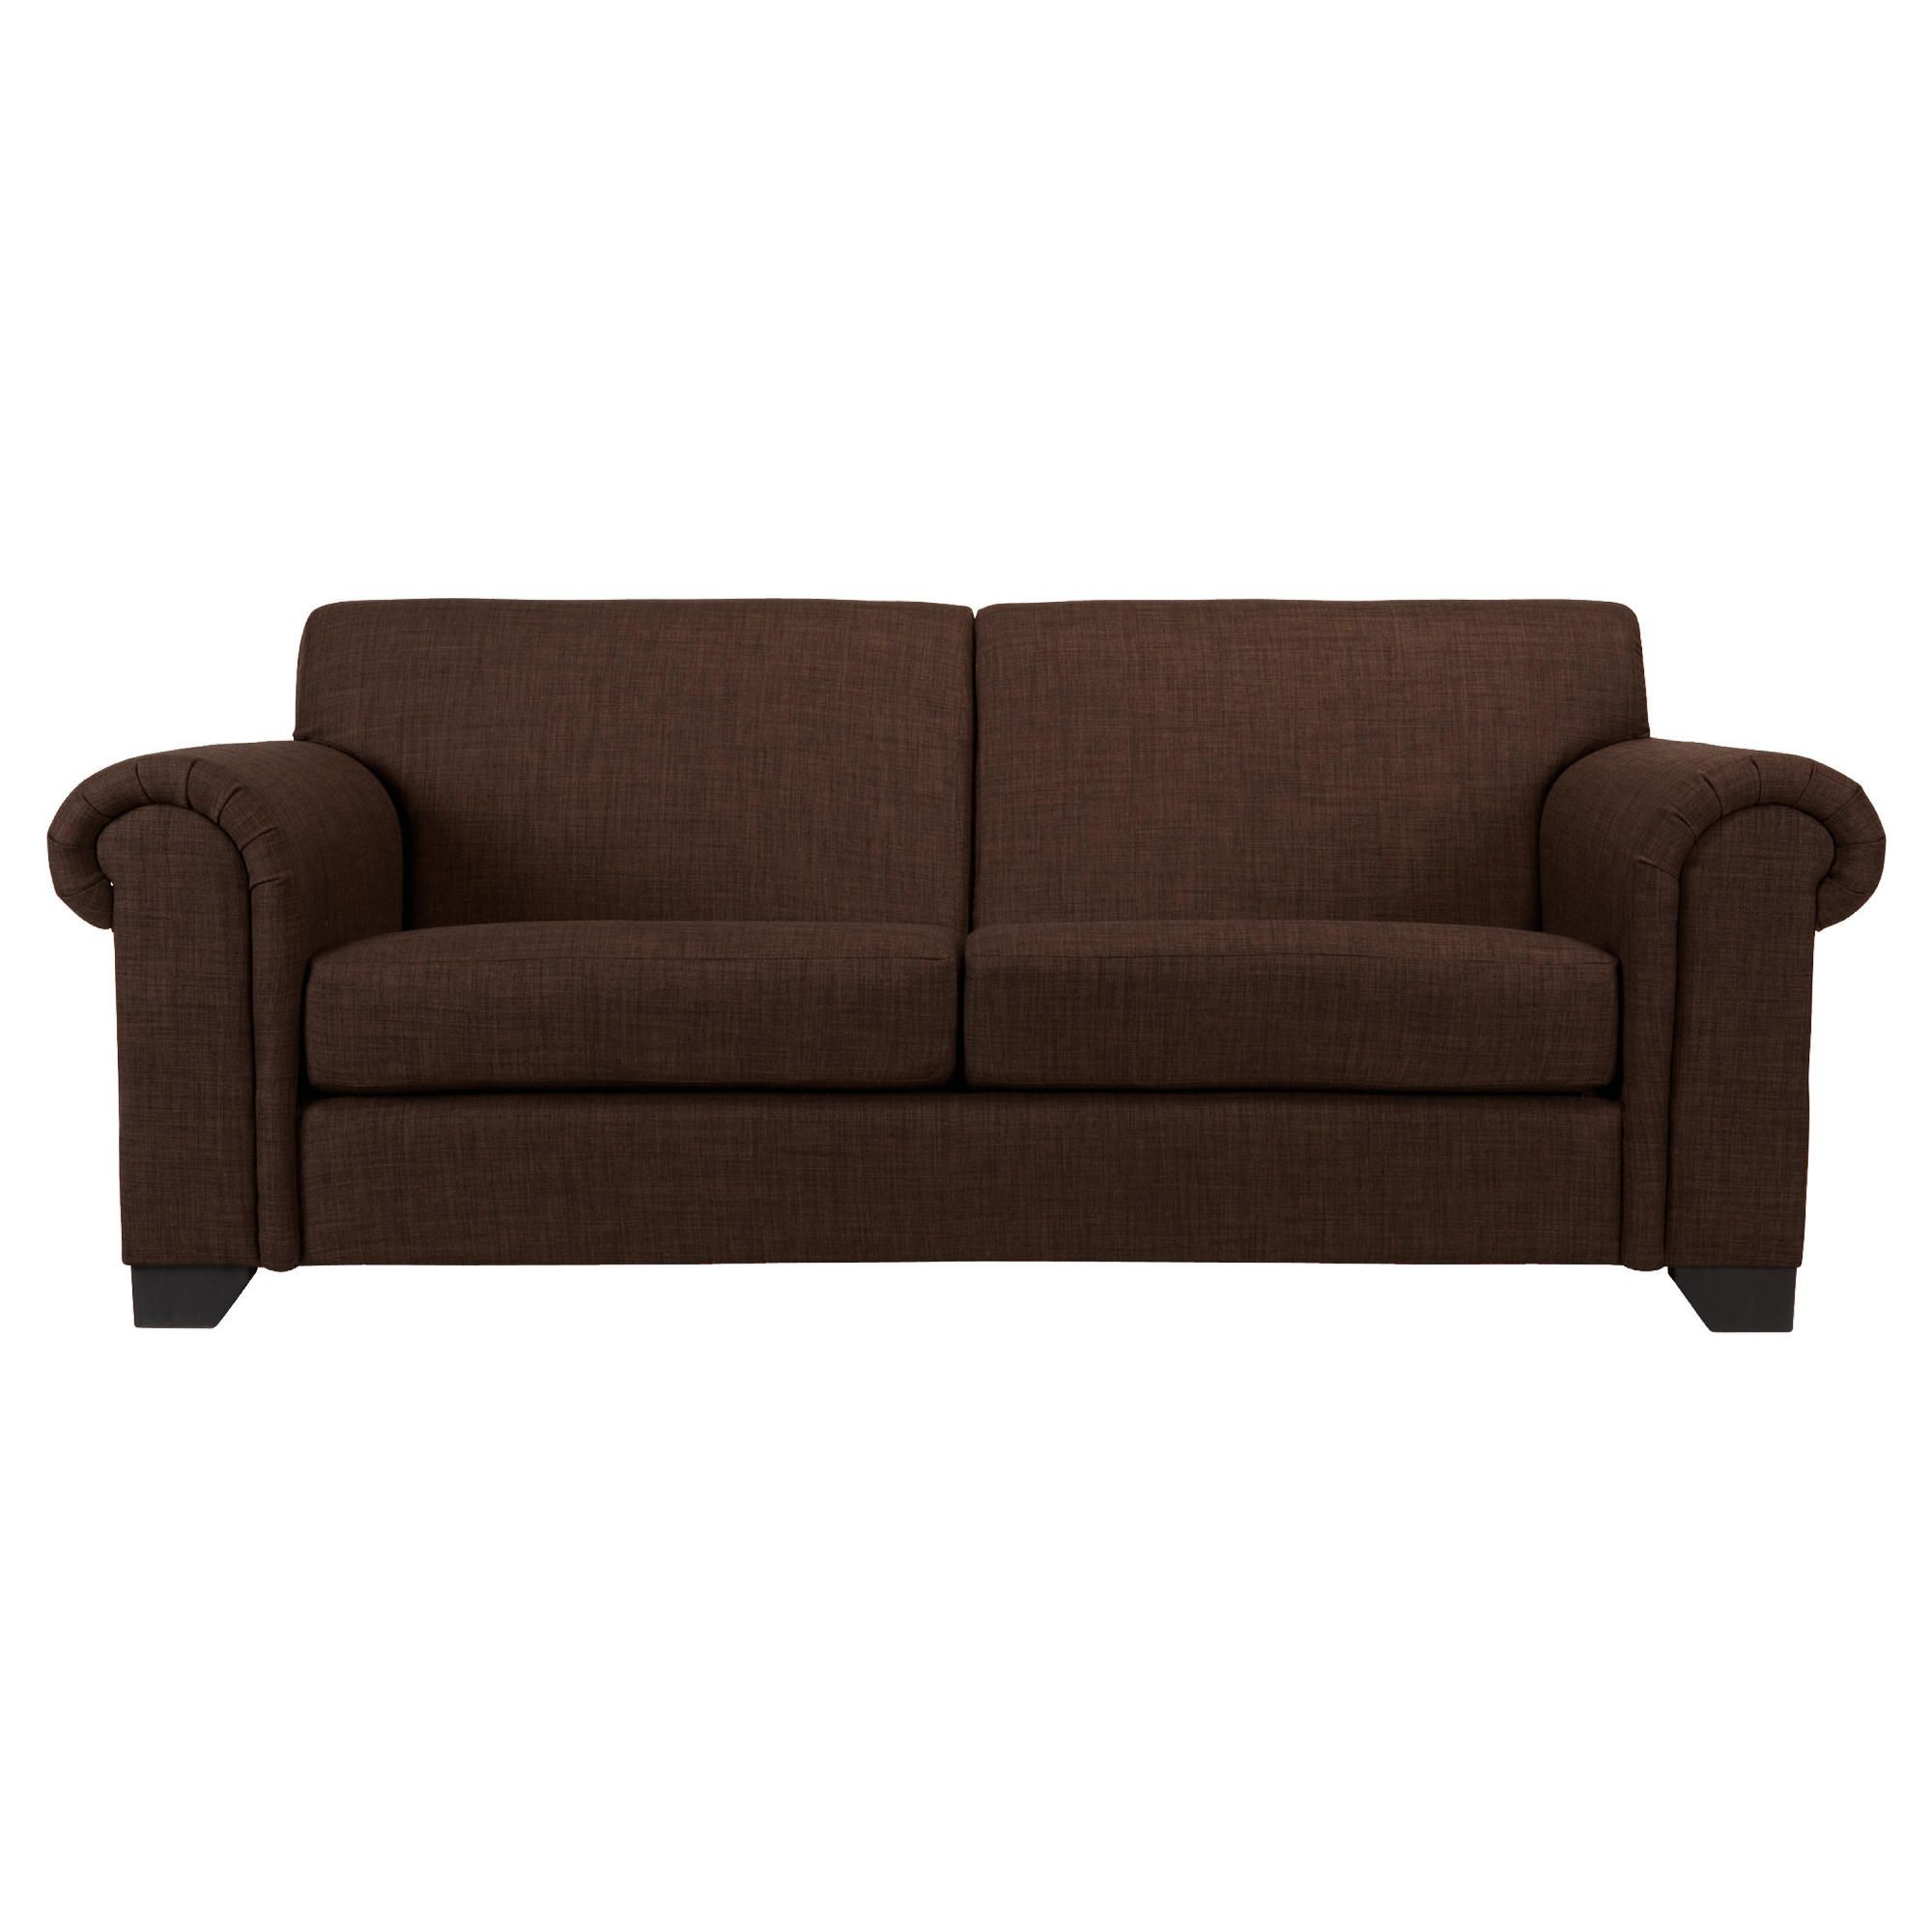 Chester fabric medium sofa chocolate at Tesco Direct